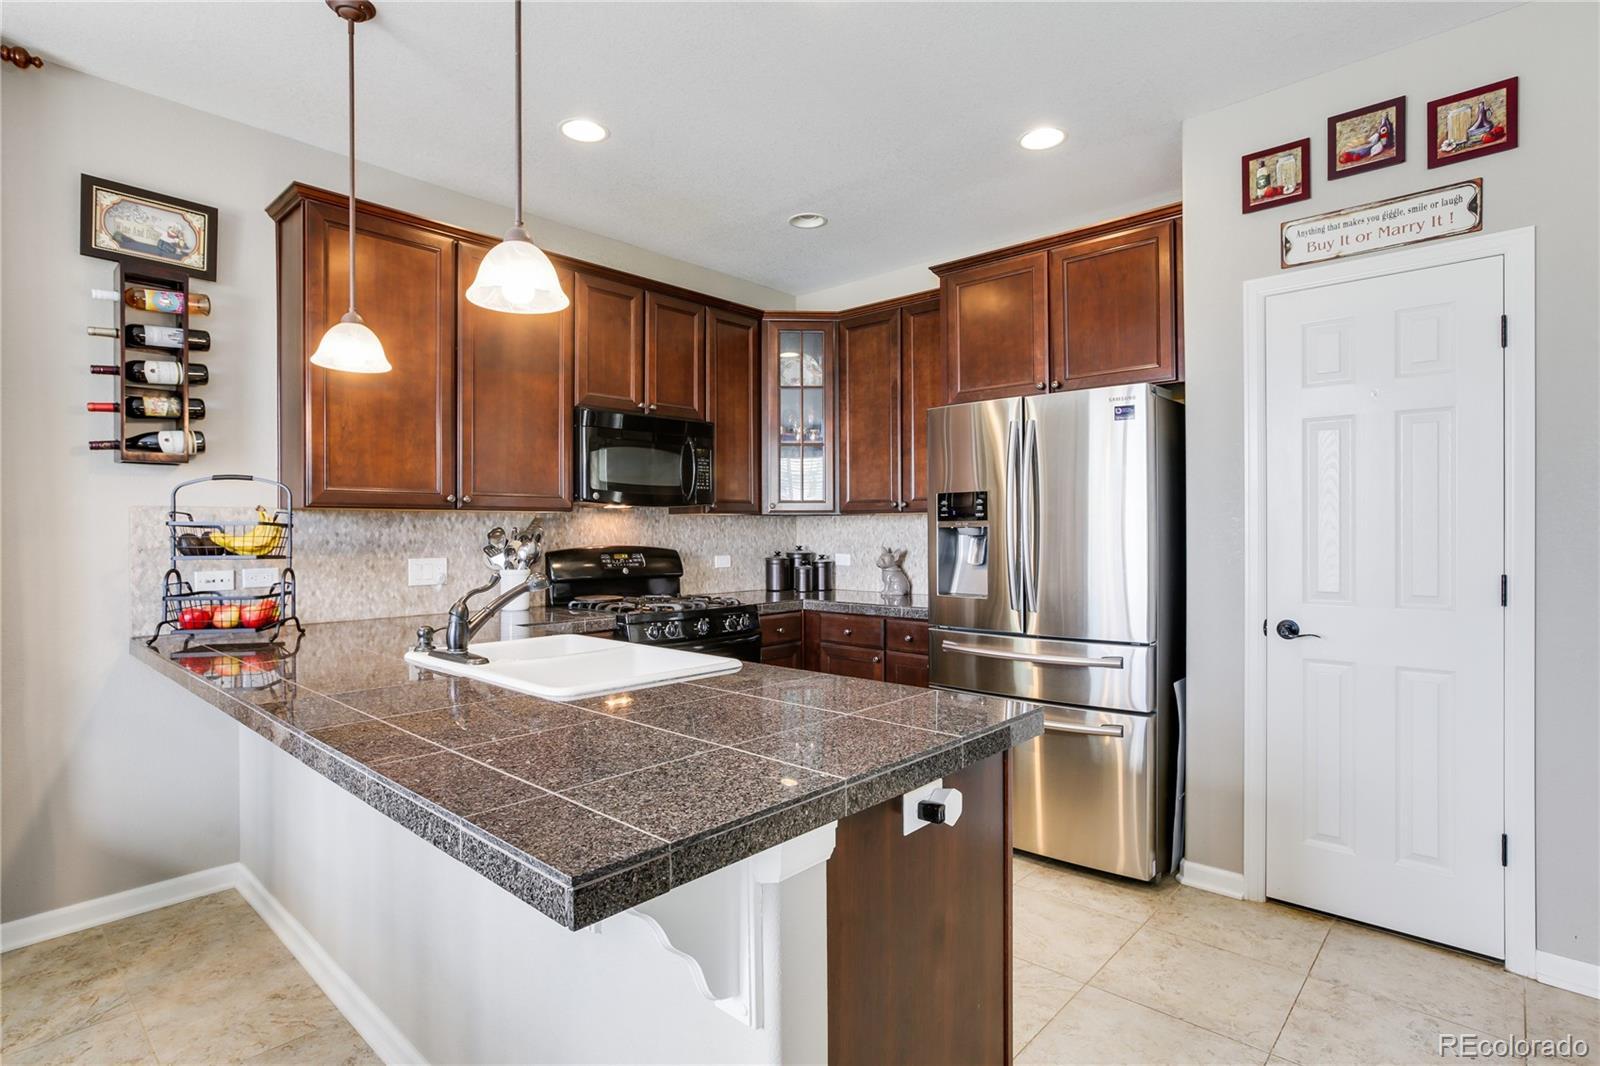 MLS# 8375714 - 10 - 8099 Sabino Lane, Castle Rock, CO 80108